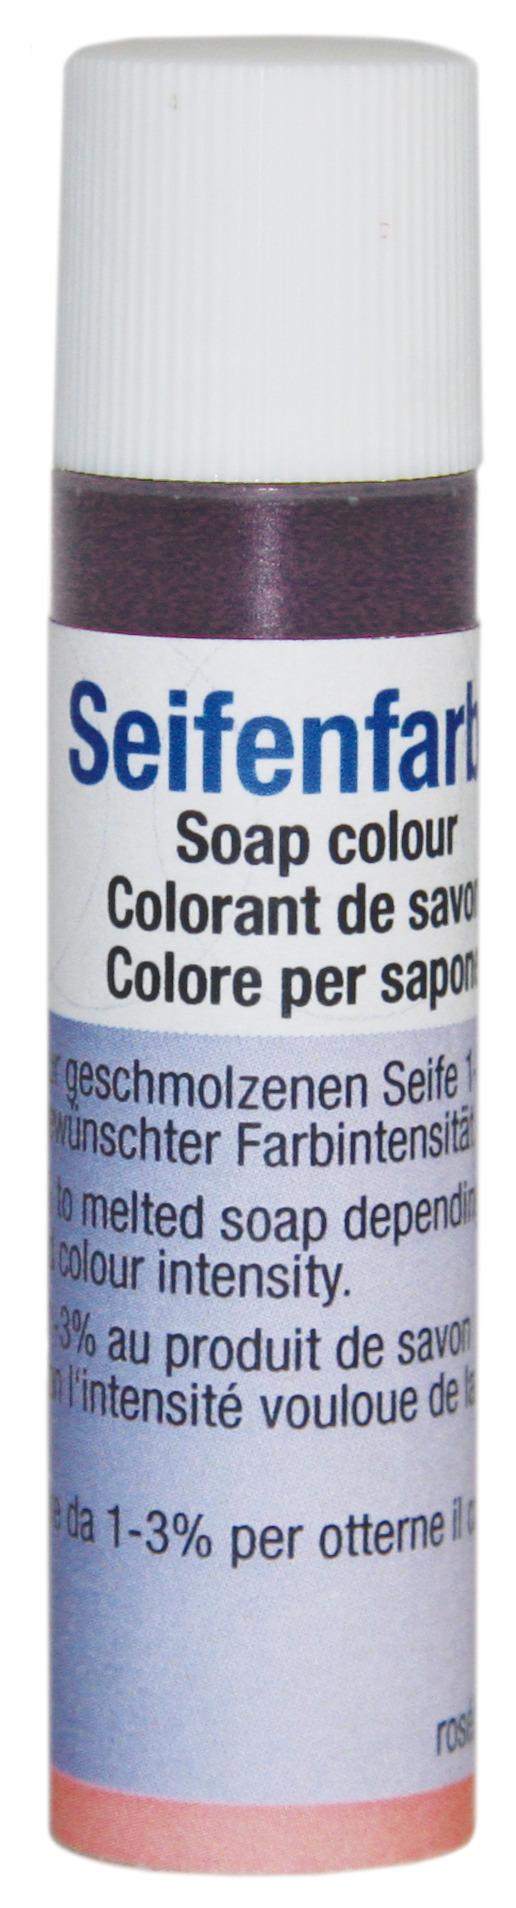 Seifenfarben opak - 16er-Set